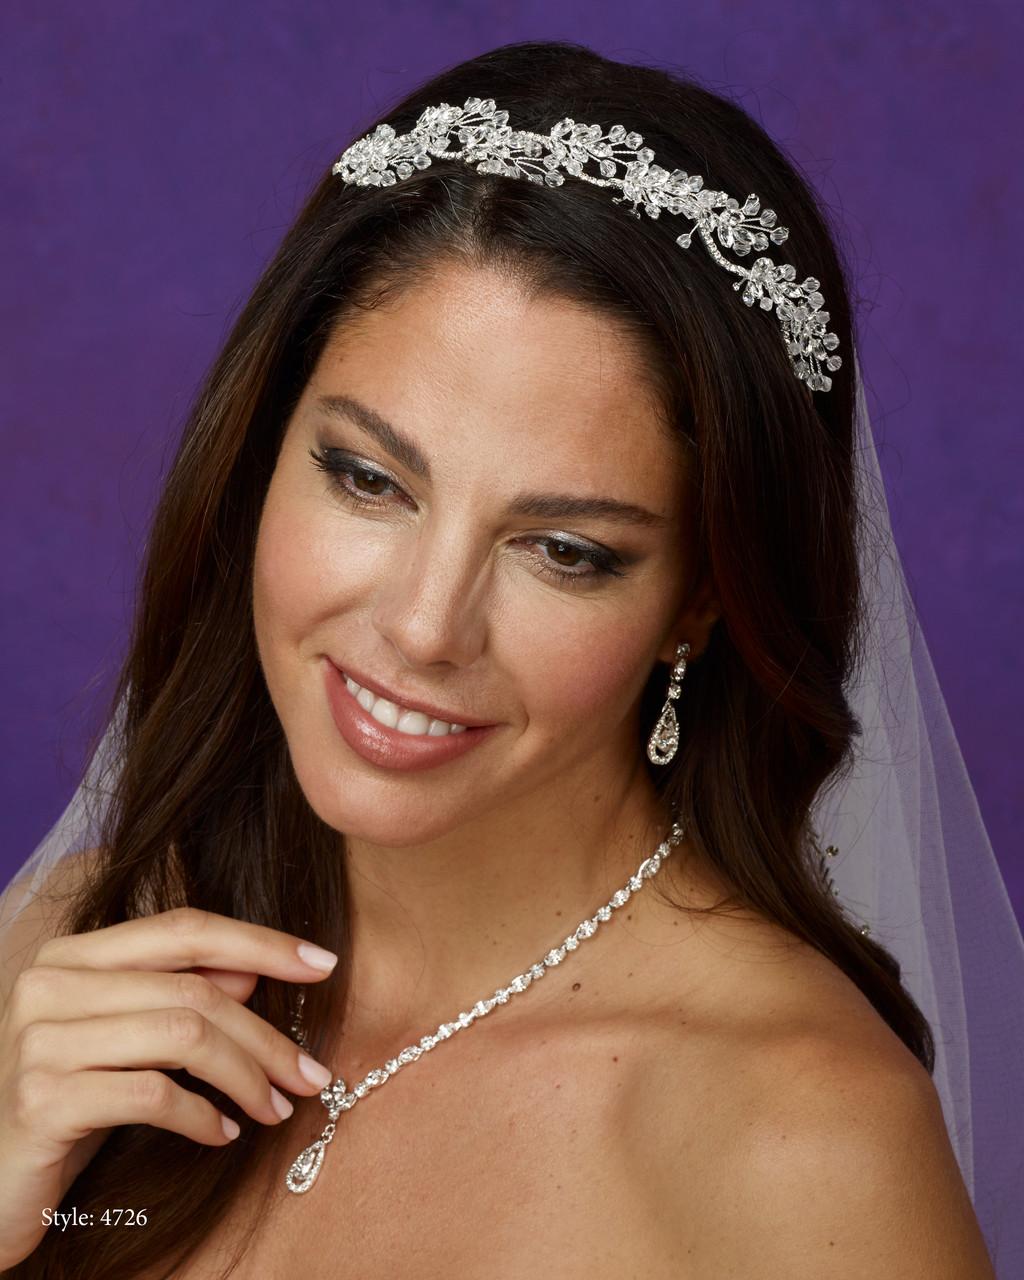 Marionat Bridal 4726 Crystal and rhinestone band - Le Crystal Collectio